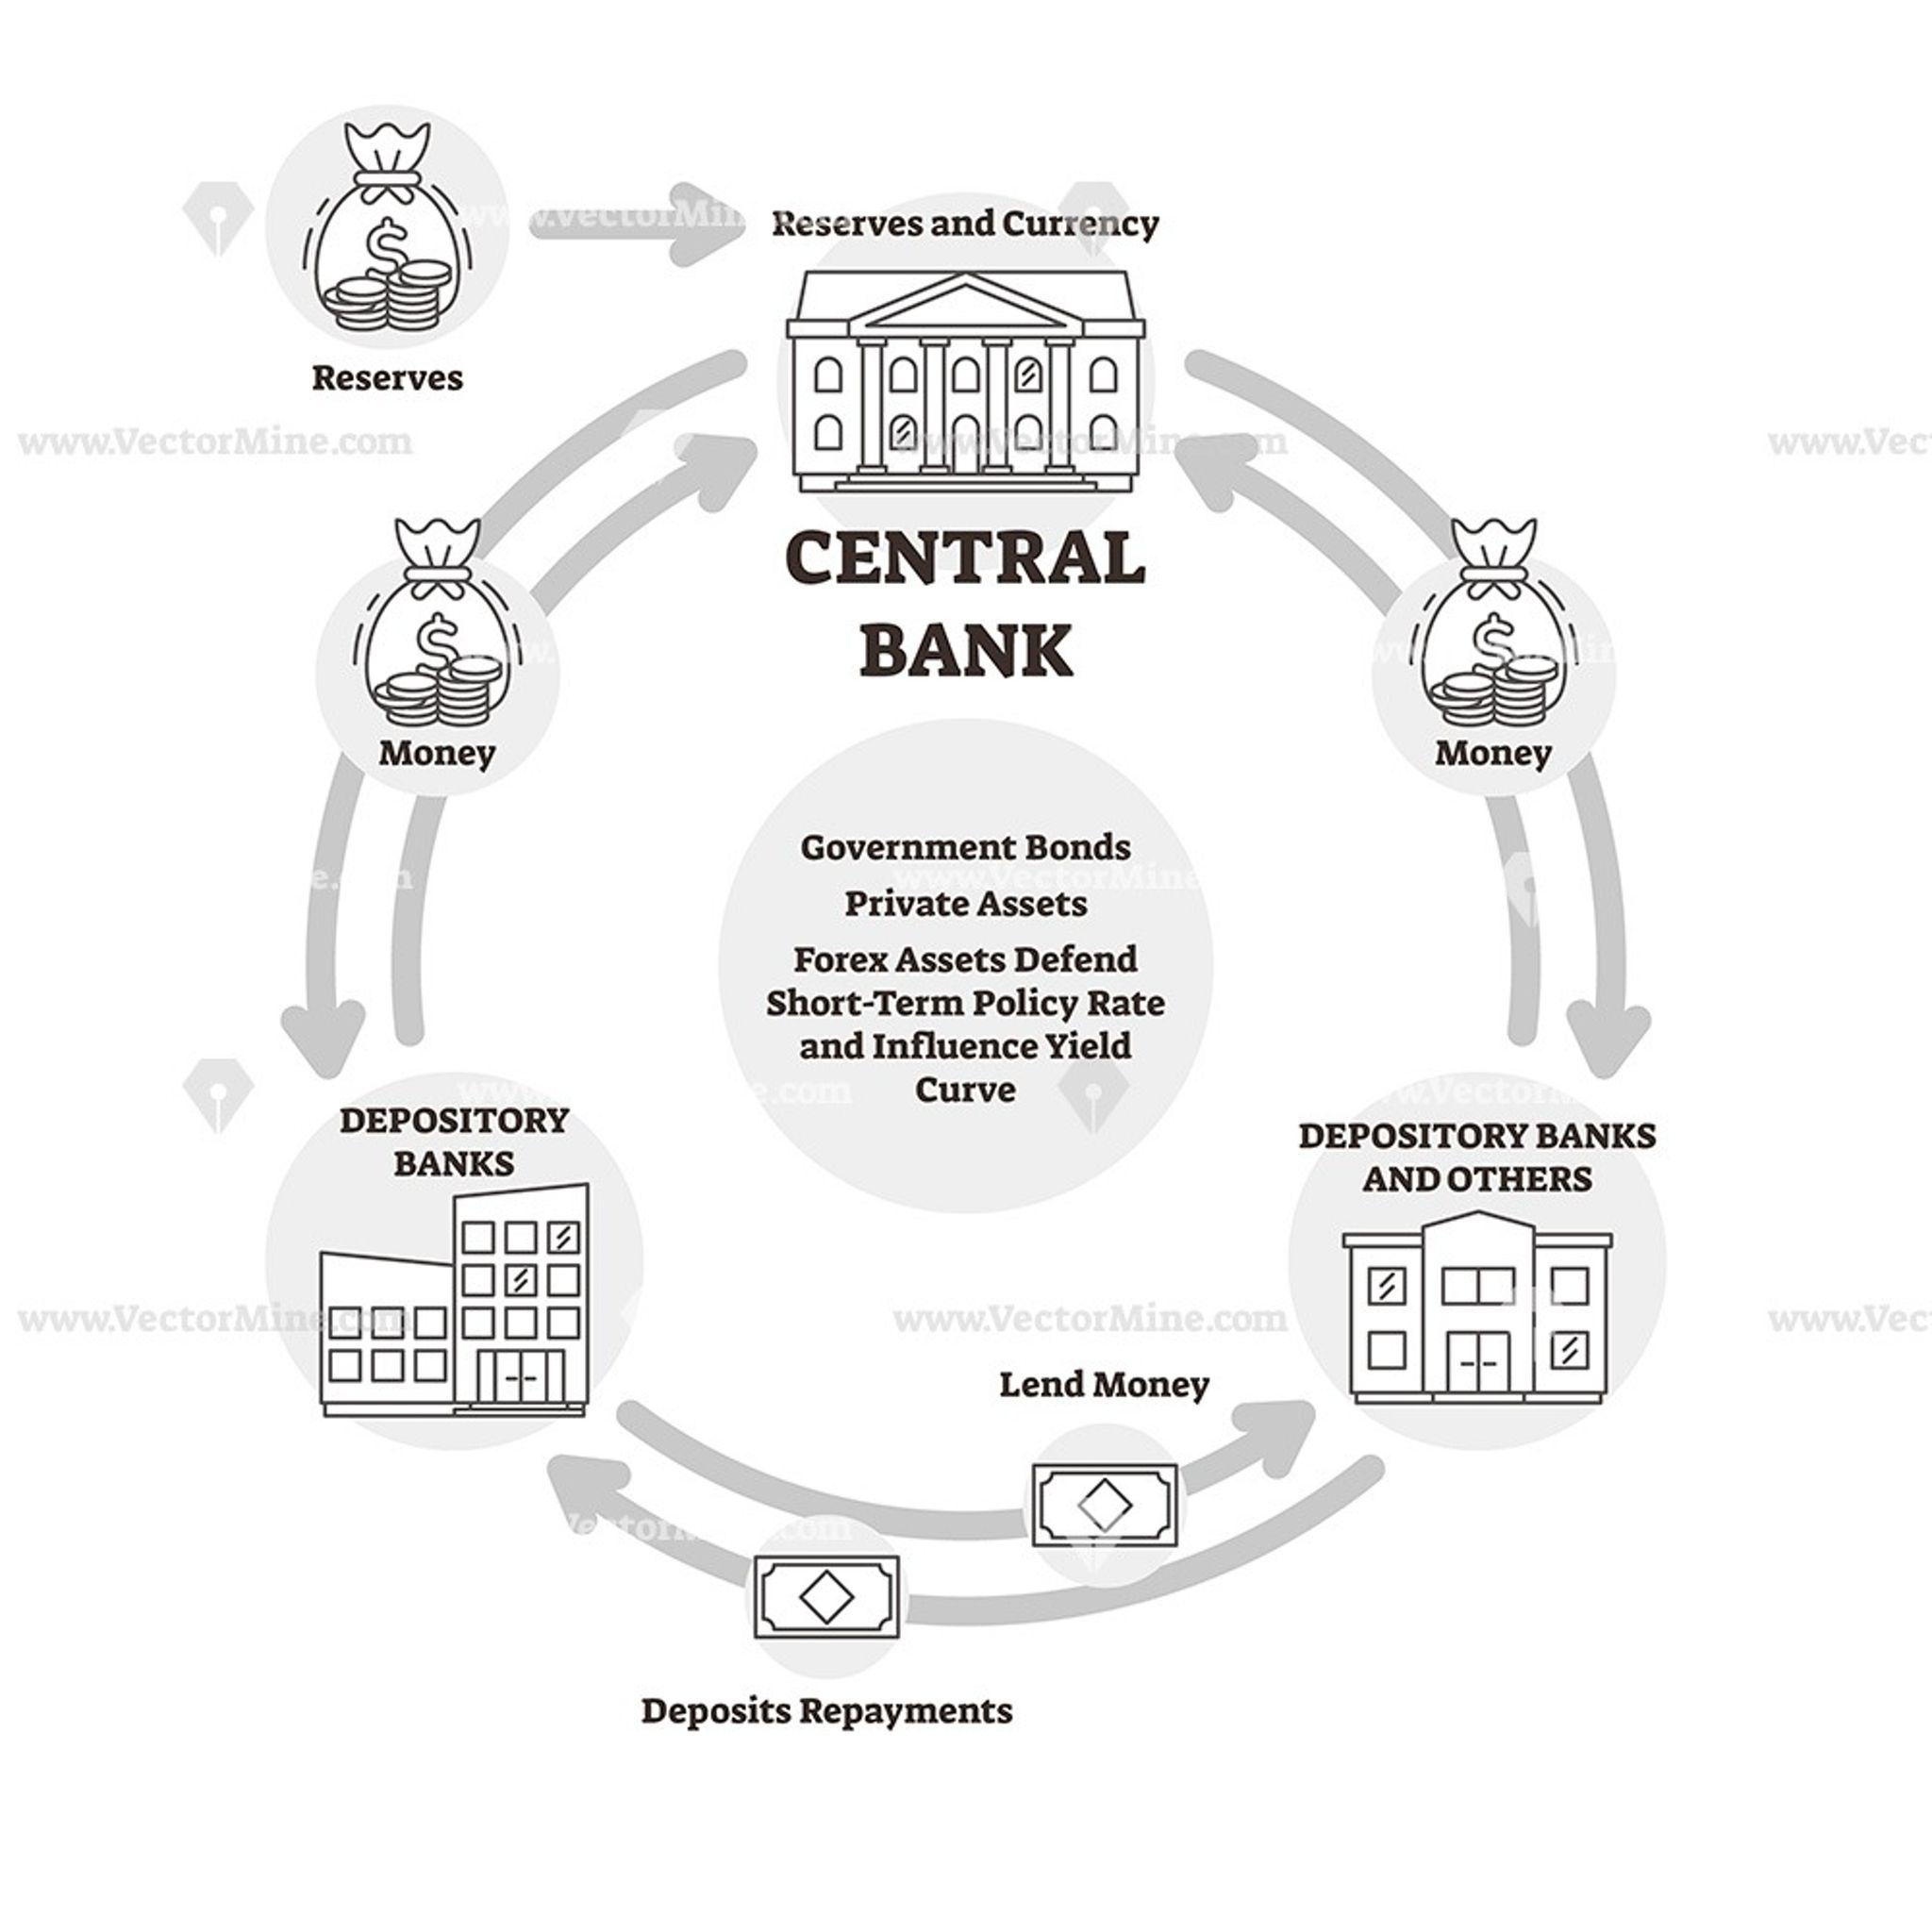 Central Bank Outline Vector Illustration Icons Diagram